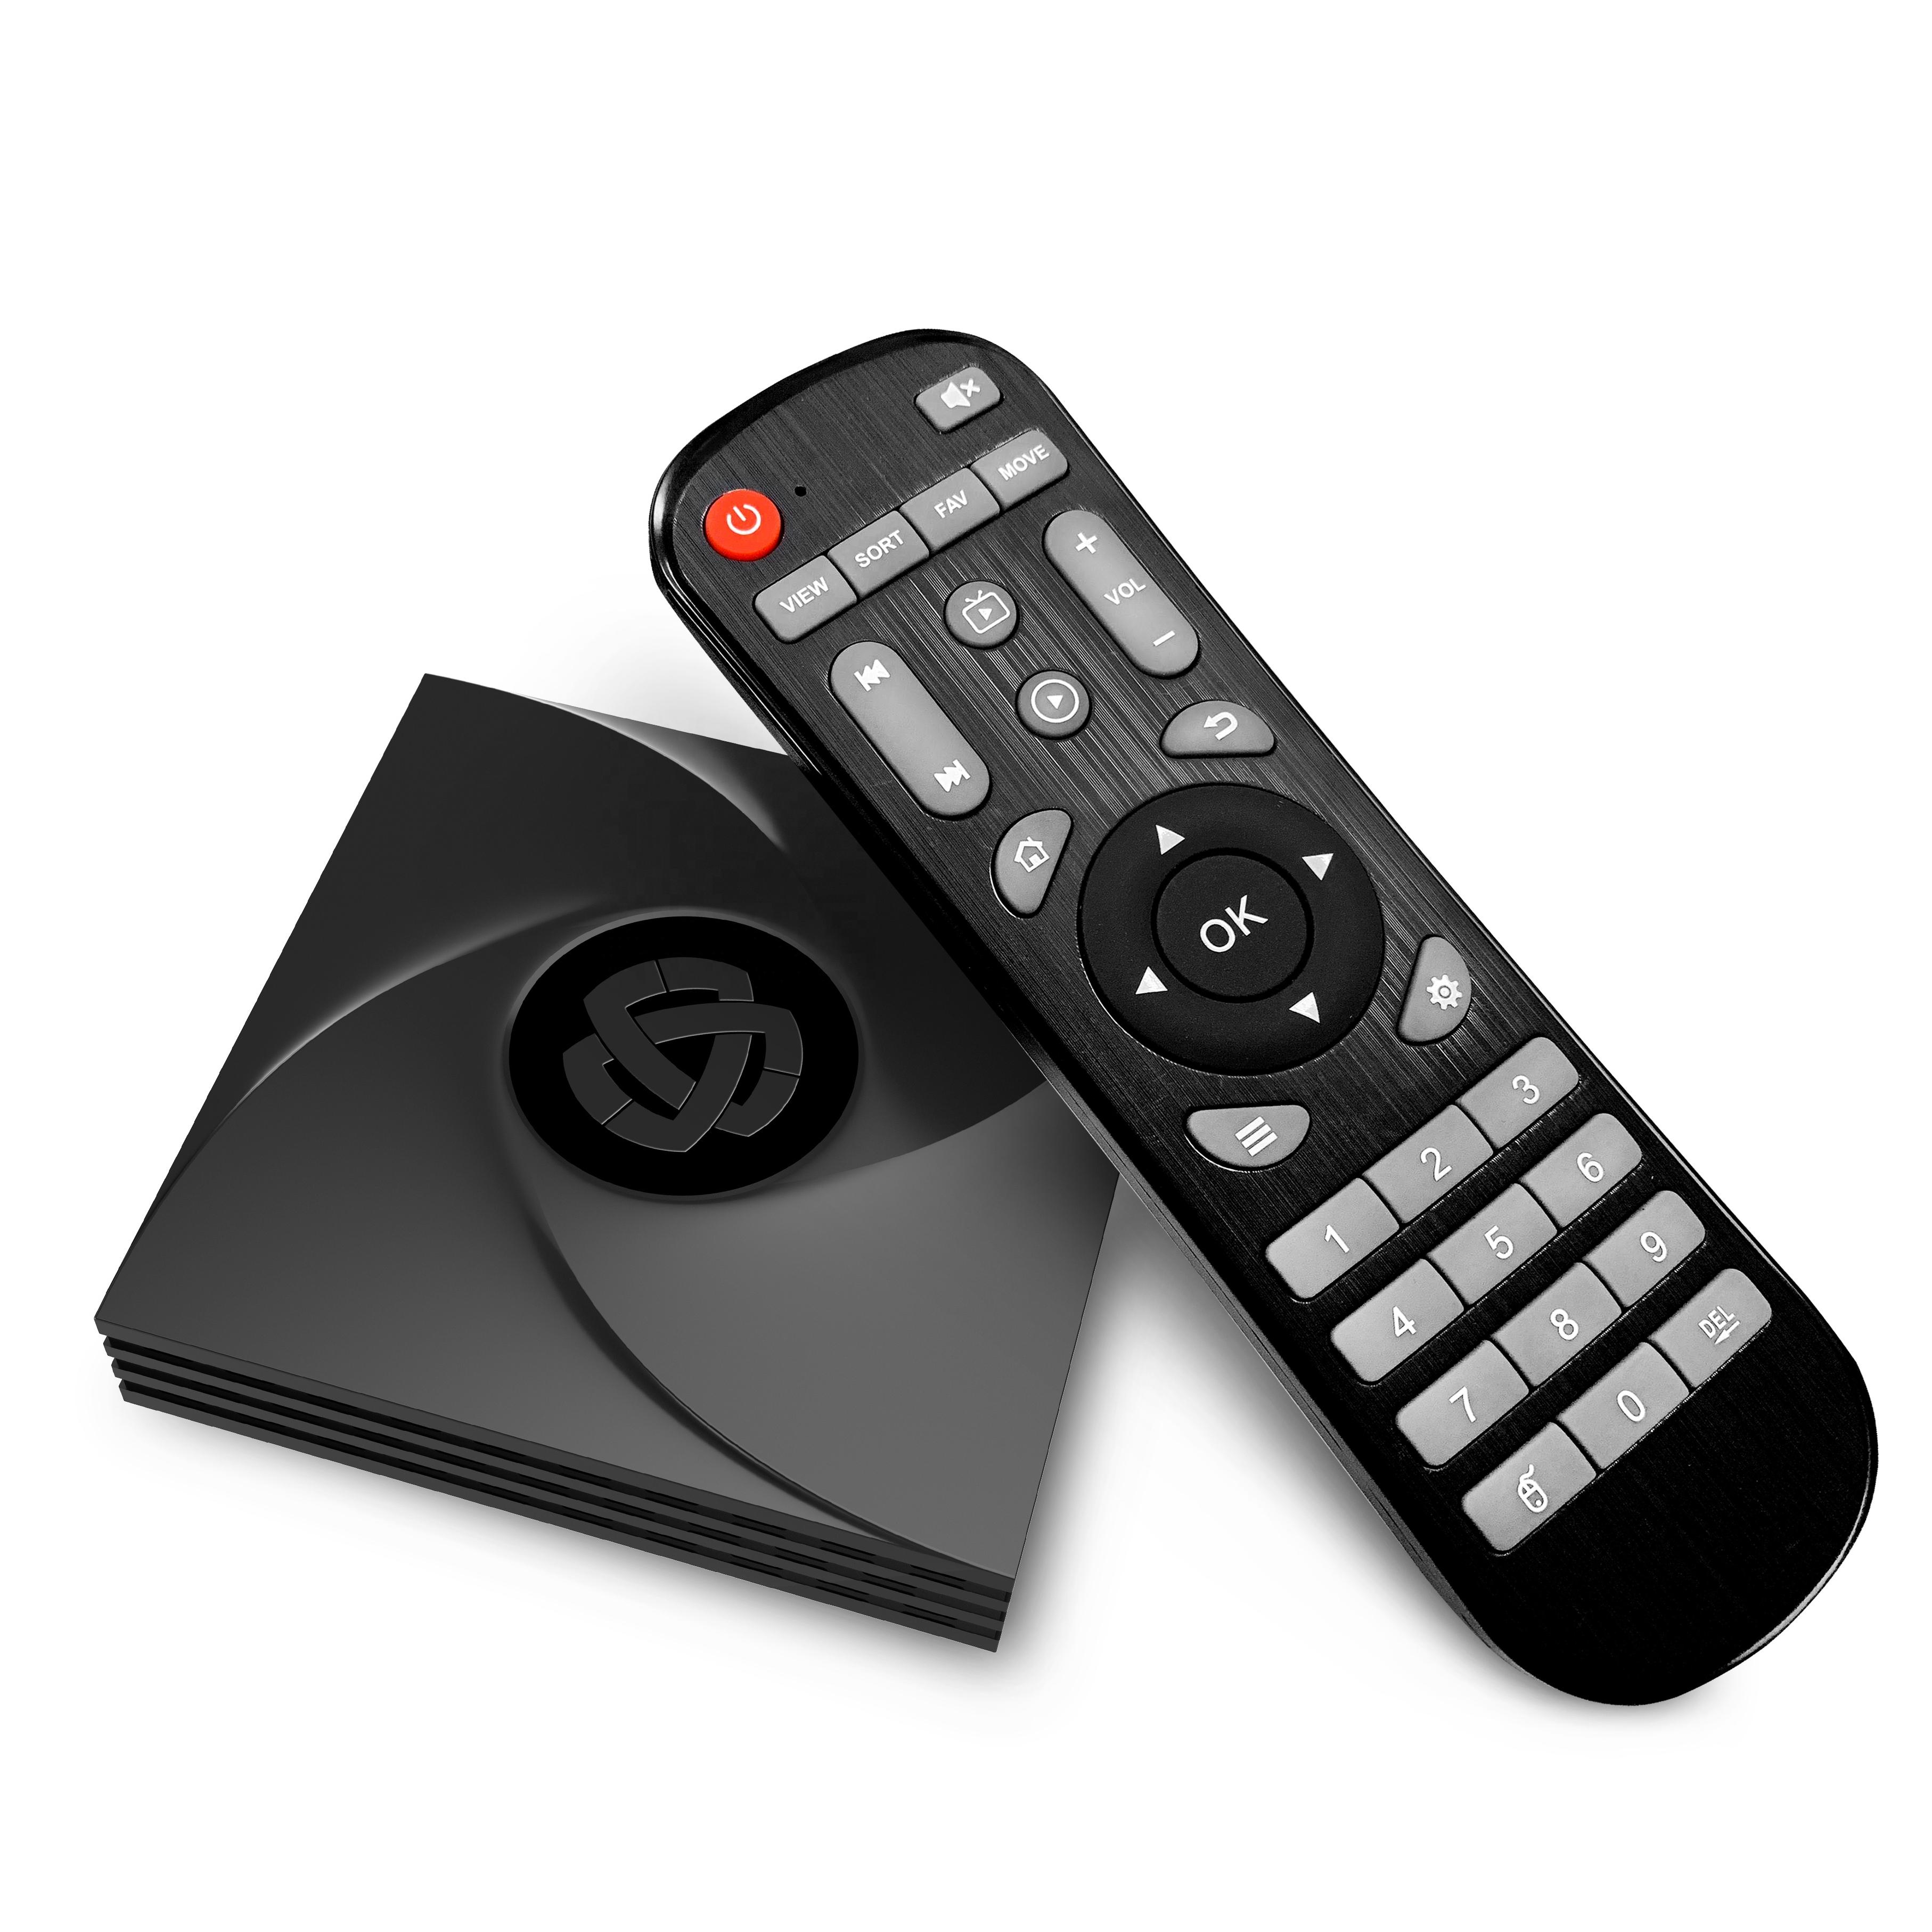 Лучший Android TV BOX HLQ RK3328 оперативная память 2 Гб Rom 16 Гб 2,4 г/5 Гб двухполосный Wi-Fi, настоящий 4K 60fps арабский медиа-бокс